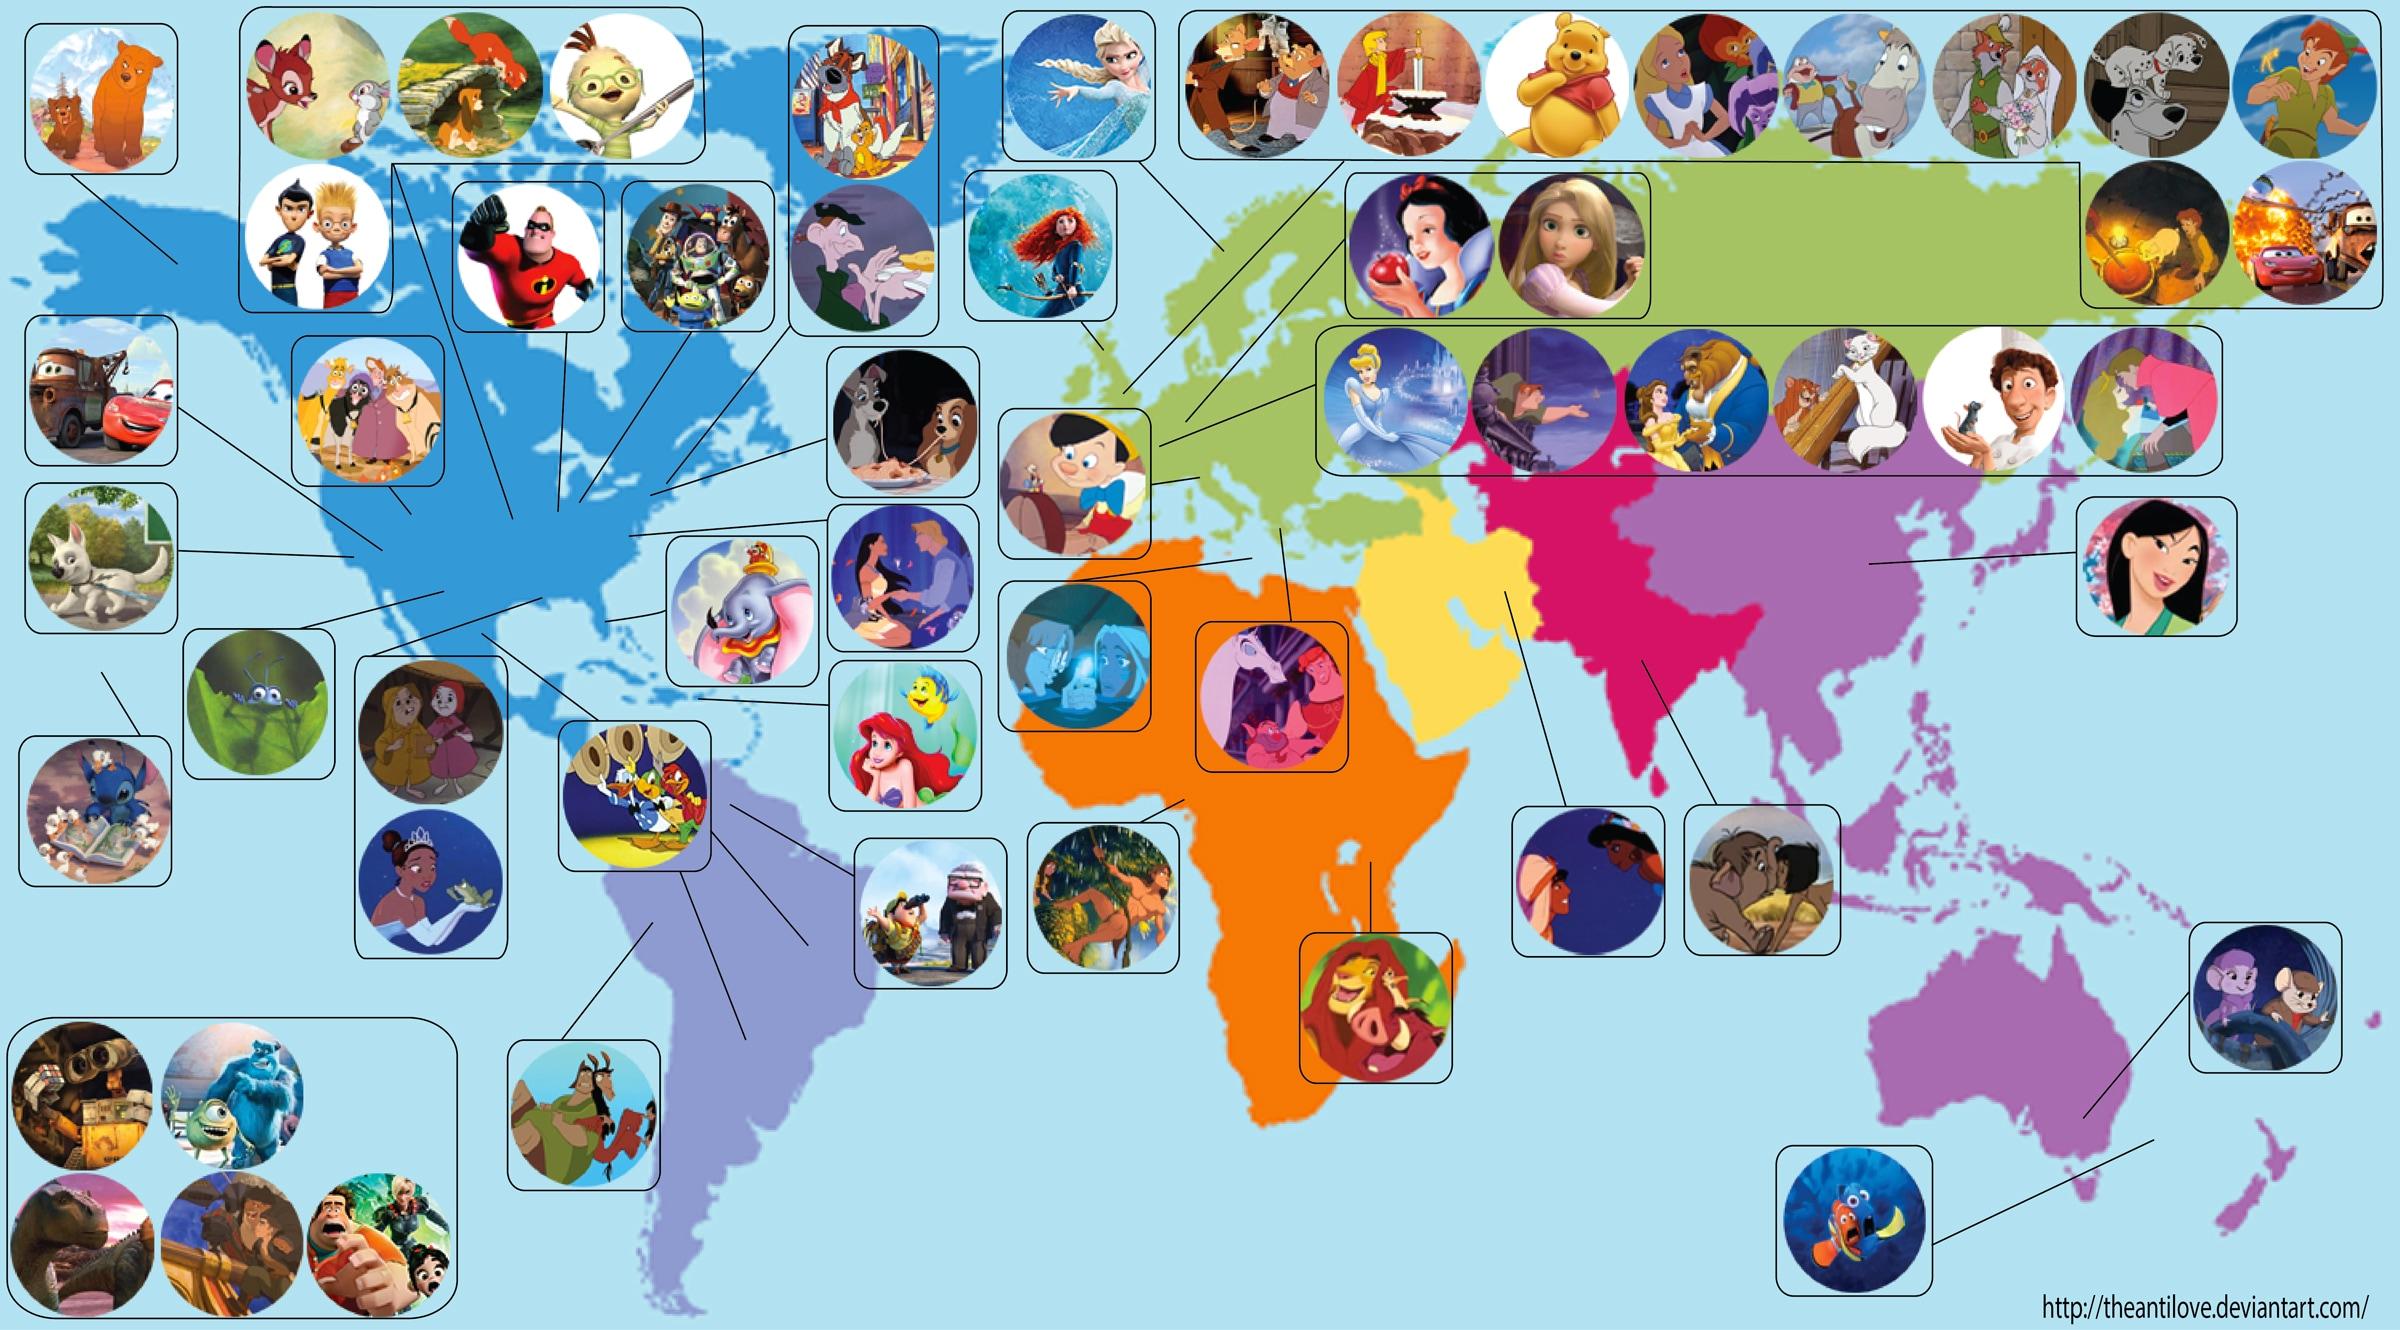 La mappa dei cartoni animati della disney focus